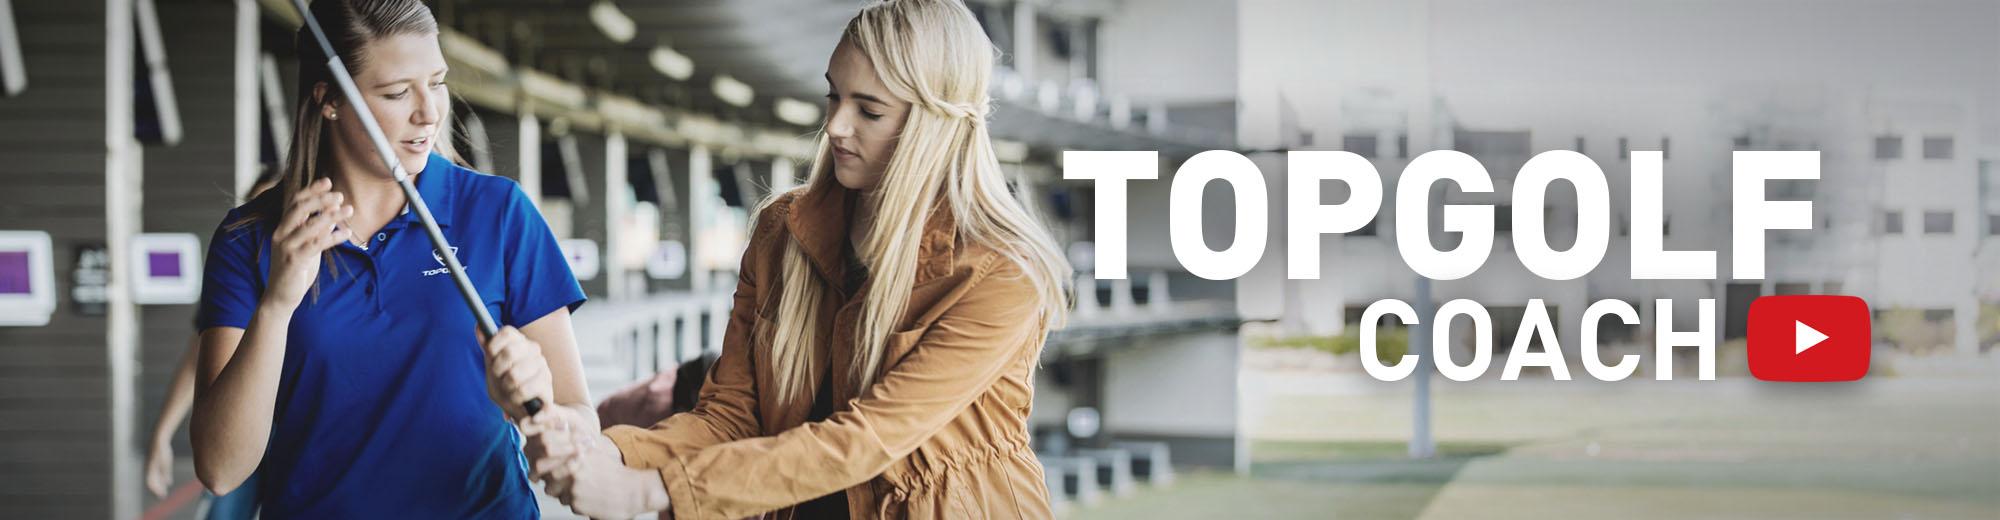 Watch: Topgolf Coach